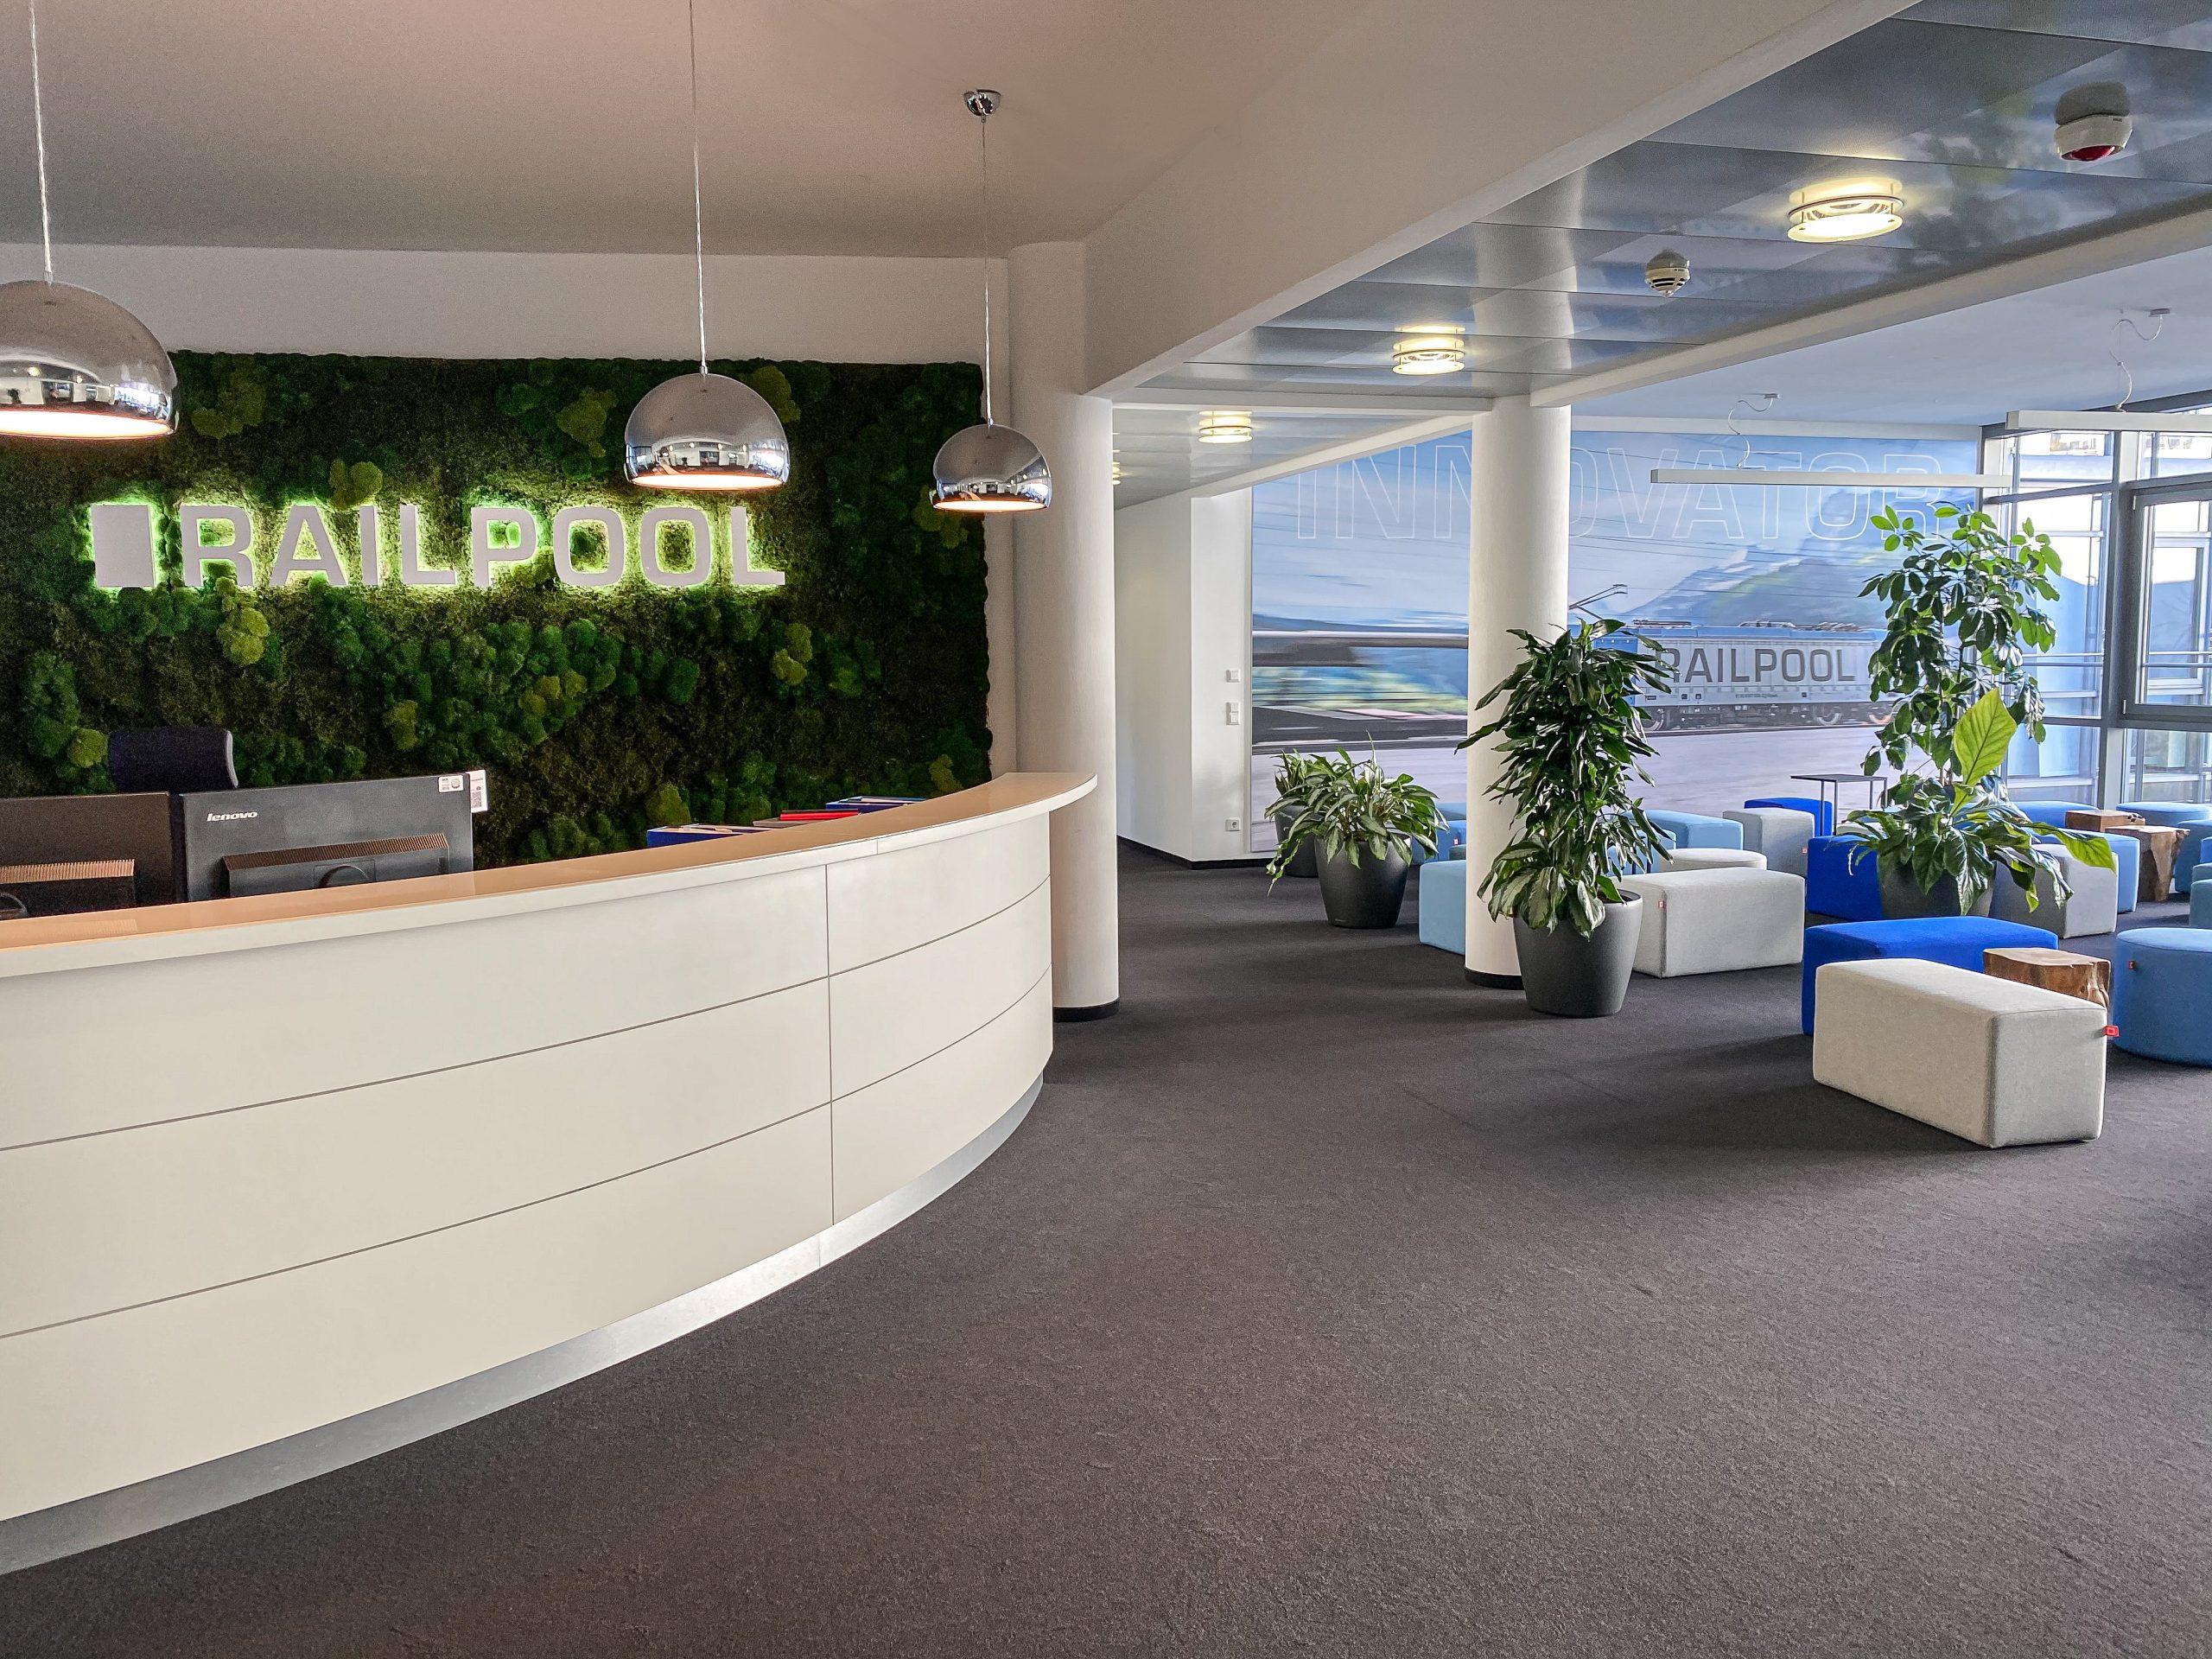 Railpool Office Bilder - Anmeldung